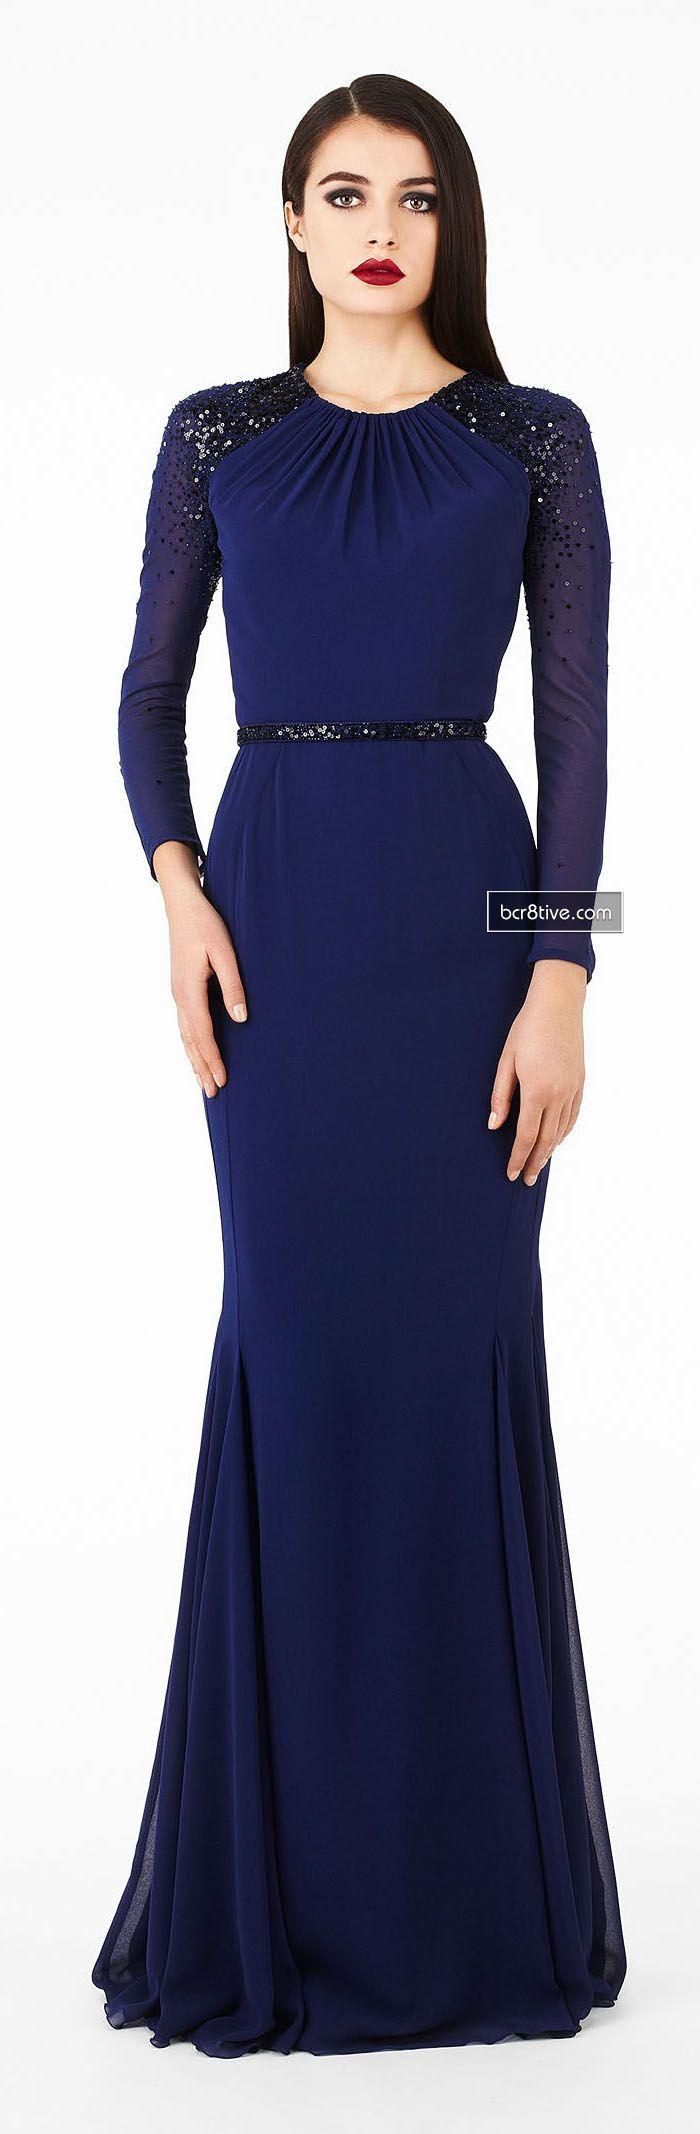 best images about bridesmaids dresses on pinterest slate v